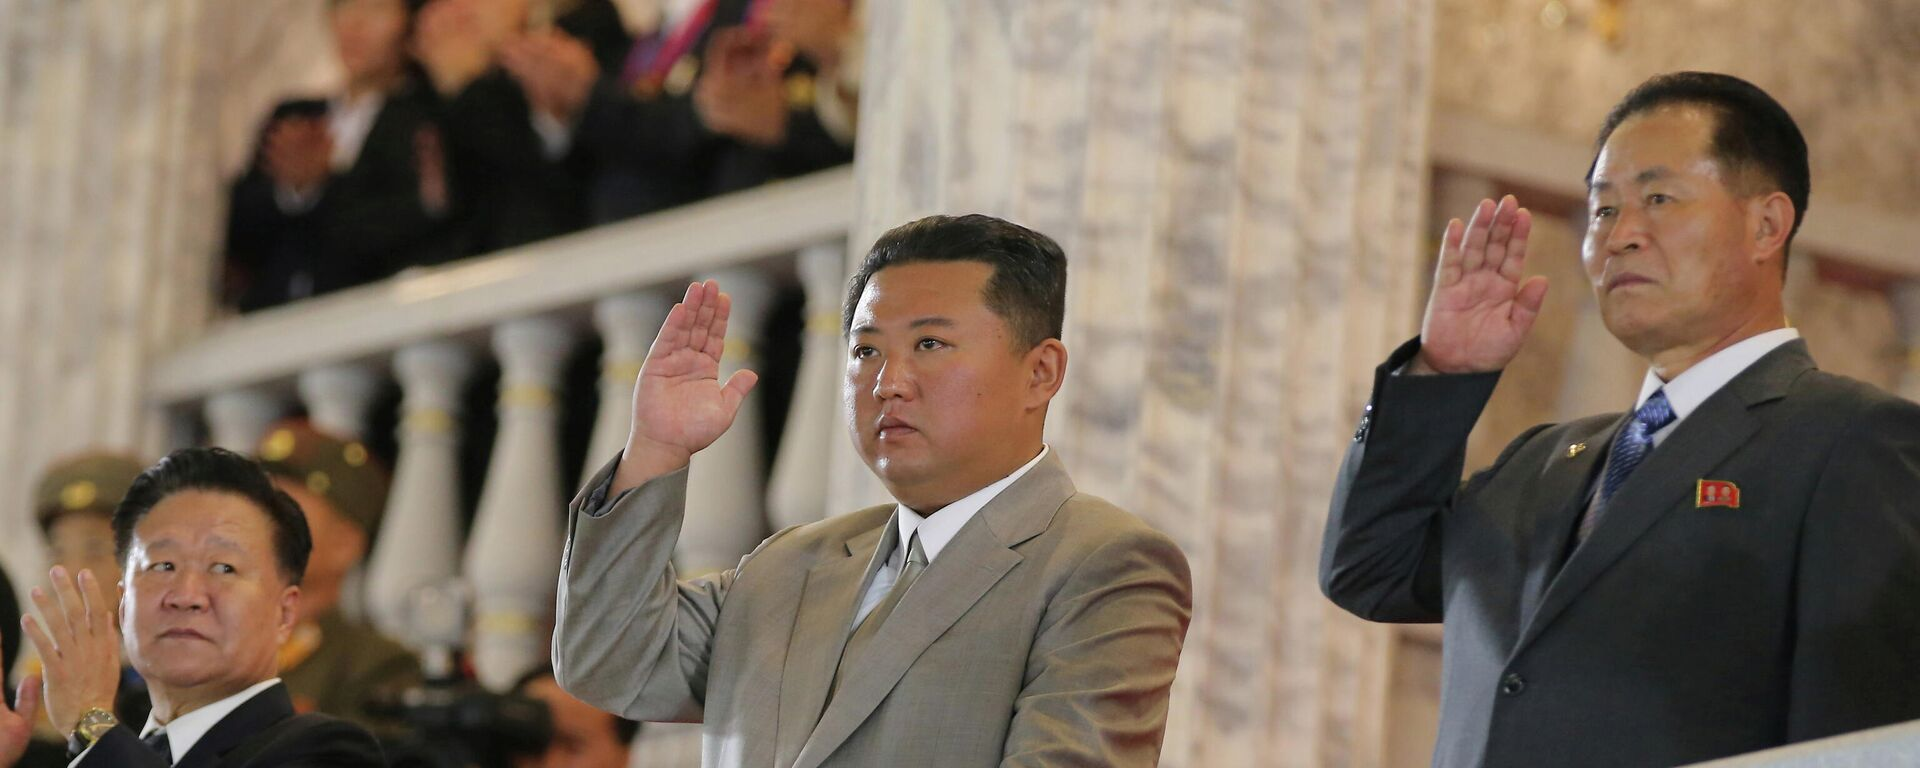 Kim Jong-un, líder de Corea del Norte - Sputnik Mundo, 1920, 14.09.2021